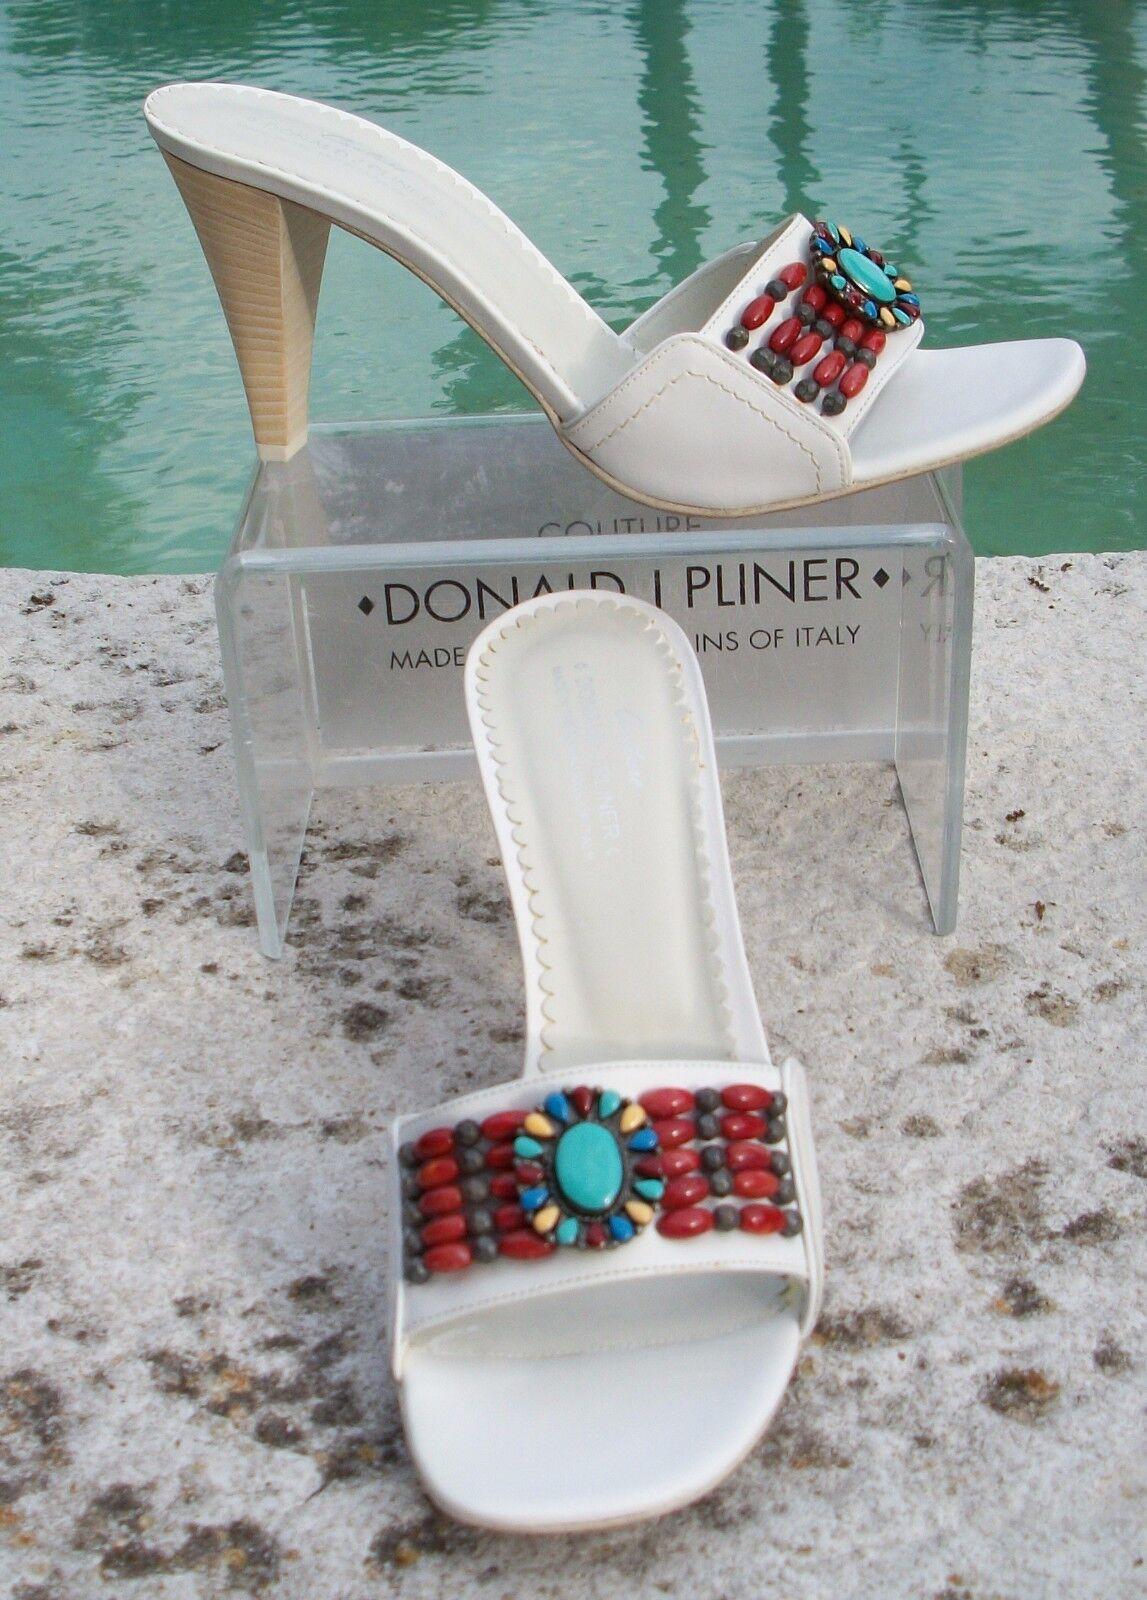 Donald Pliner Couture Hair Calf Leather shoes shoes shoes New 6 Ballet Flat Skimmer  295 NIB 47d0bd